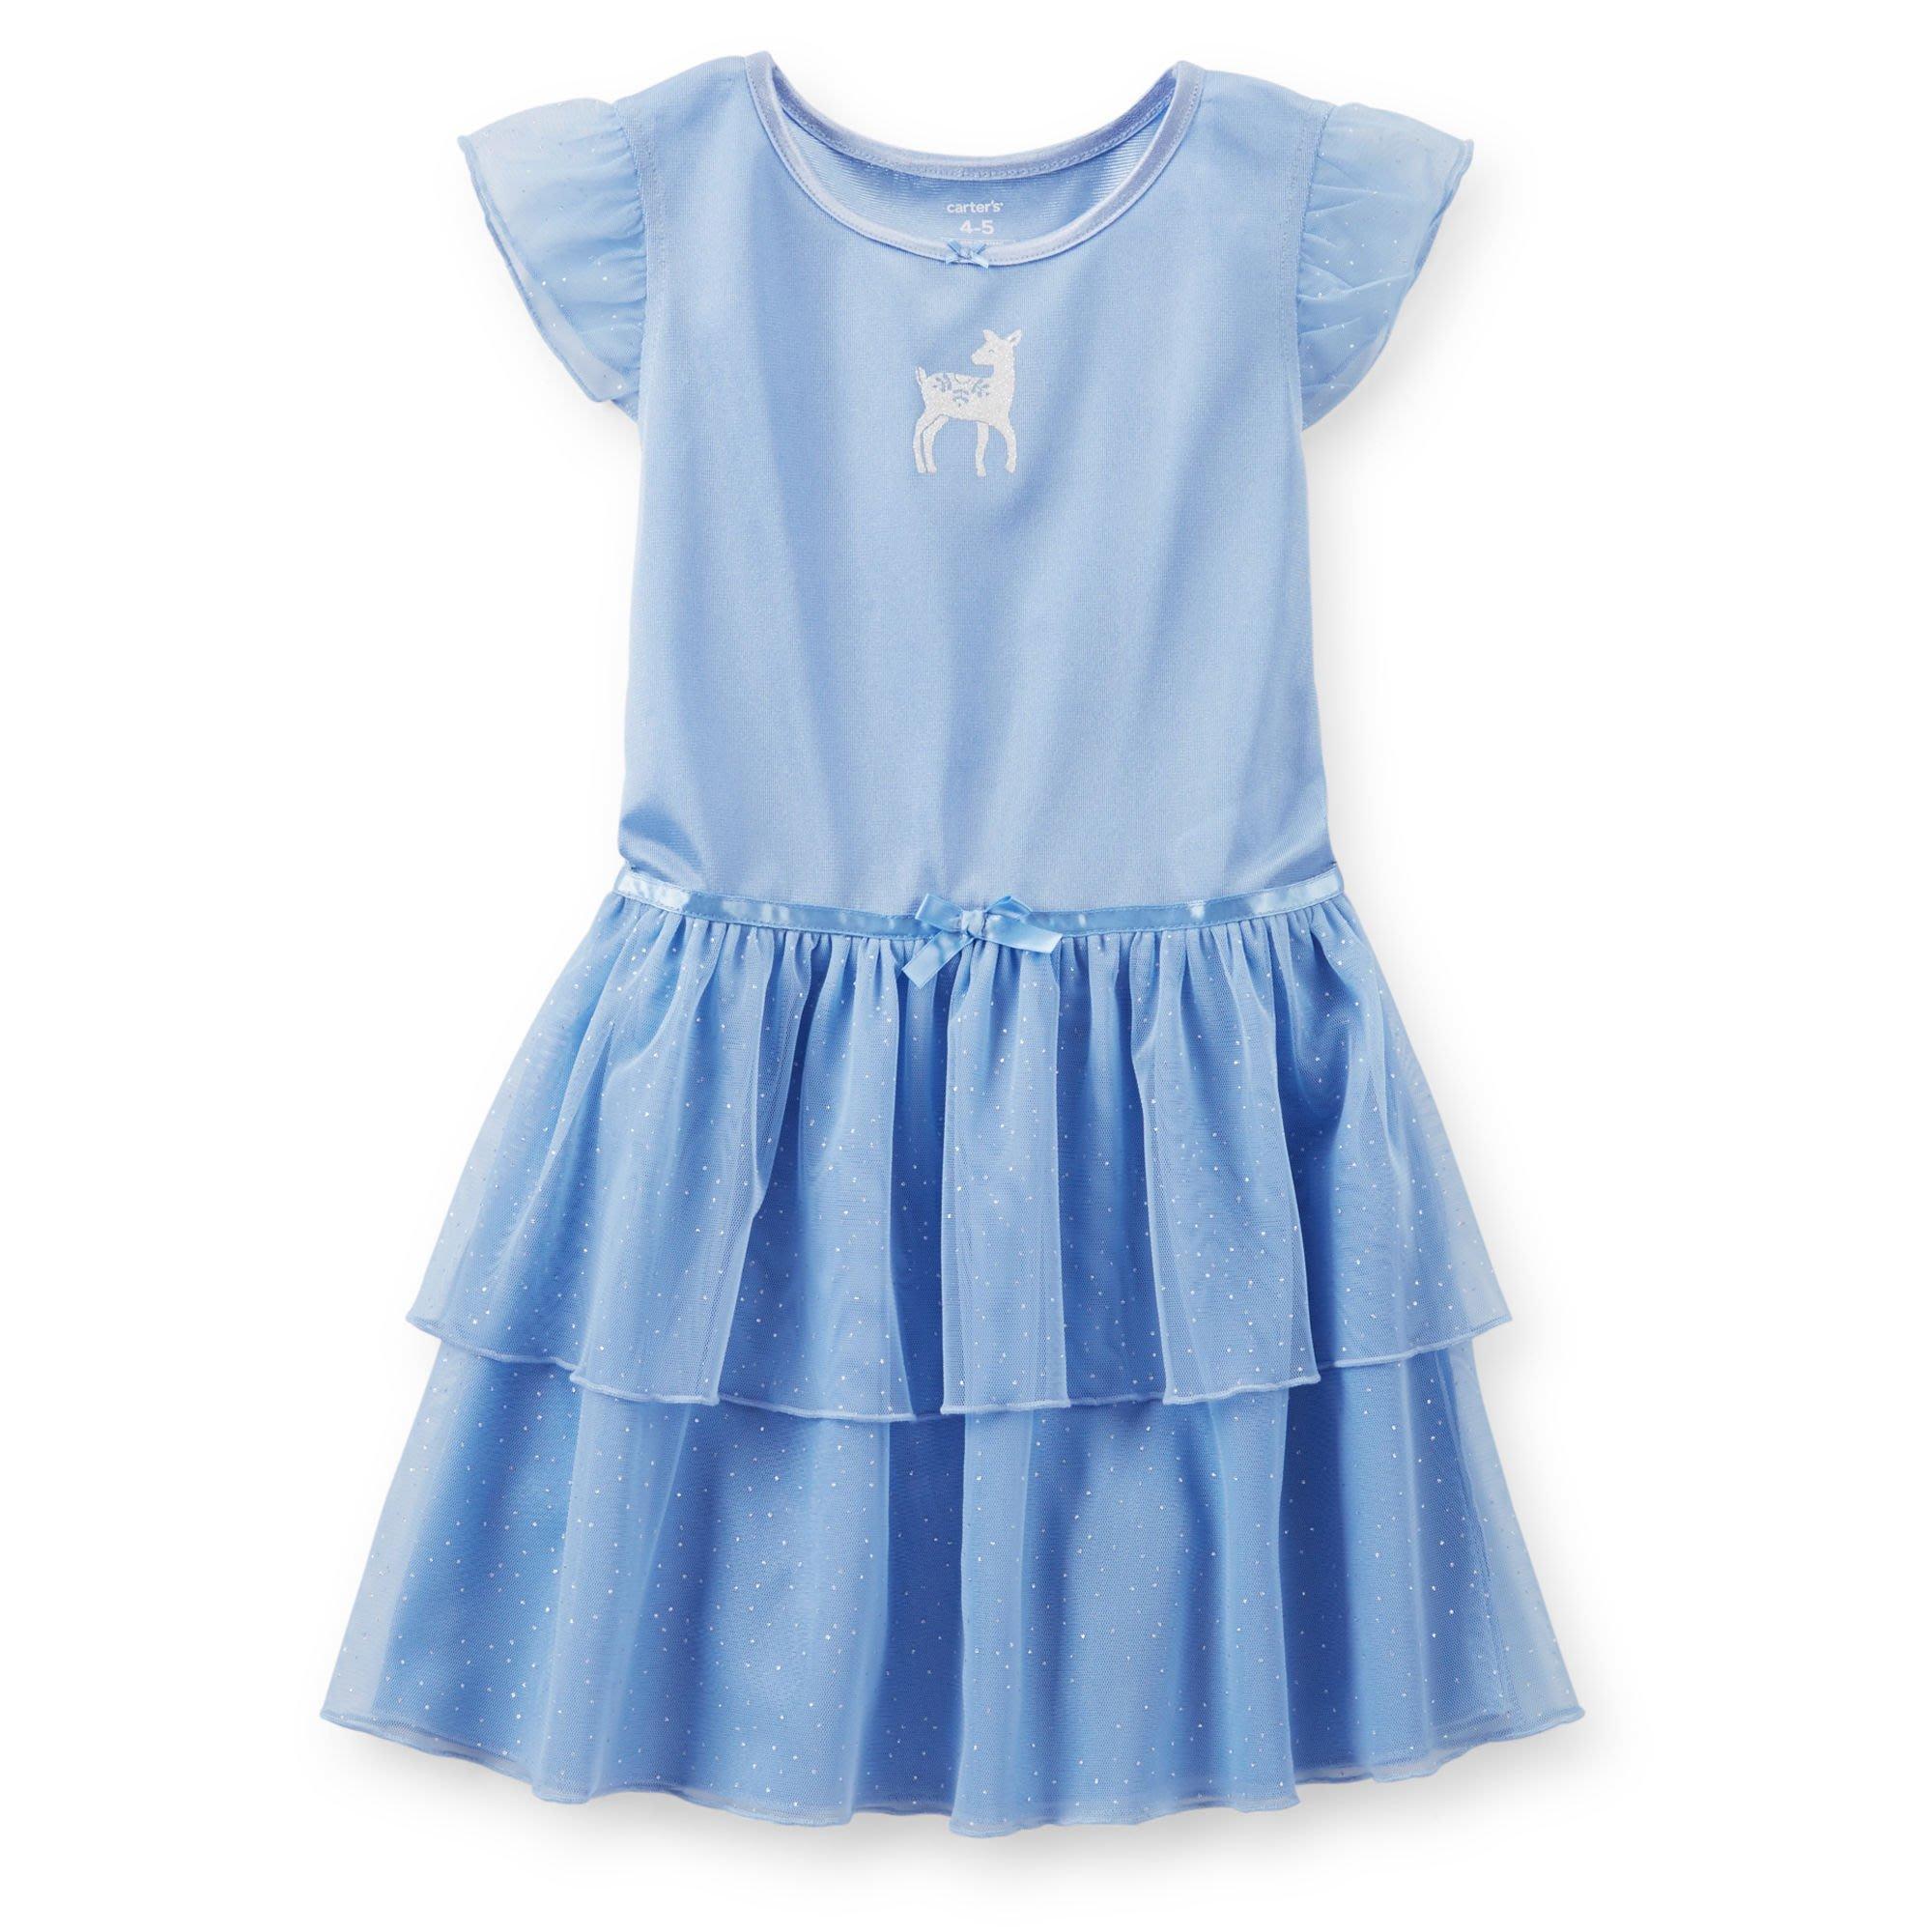 【Nicholes歐美進口優質童裝】Carters 女童藍色小鹿氣質紗裙洋裝/禮服/派對/發表會/花童